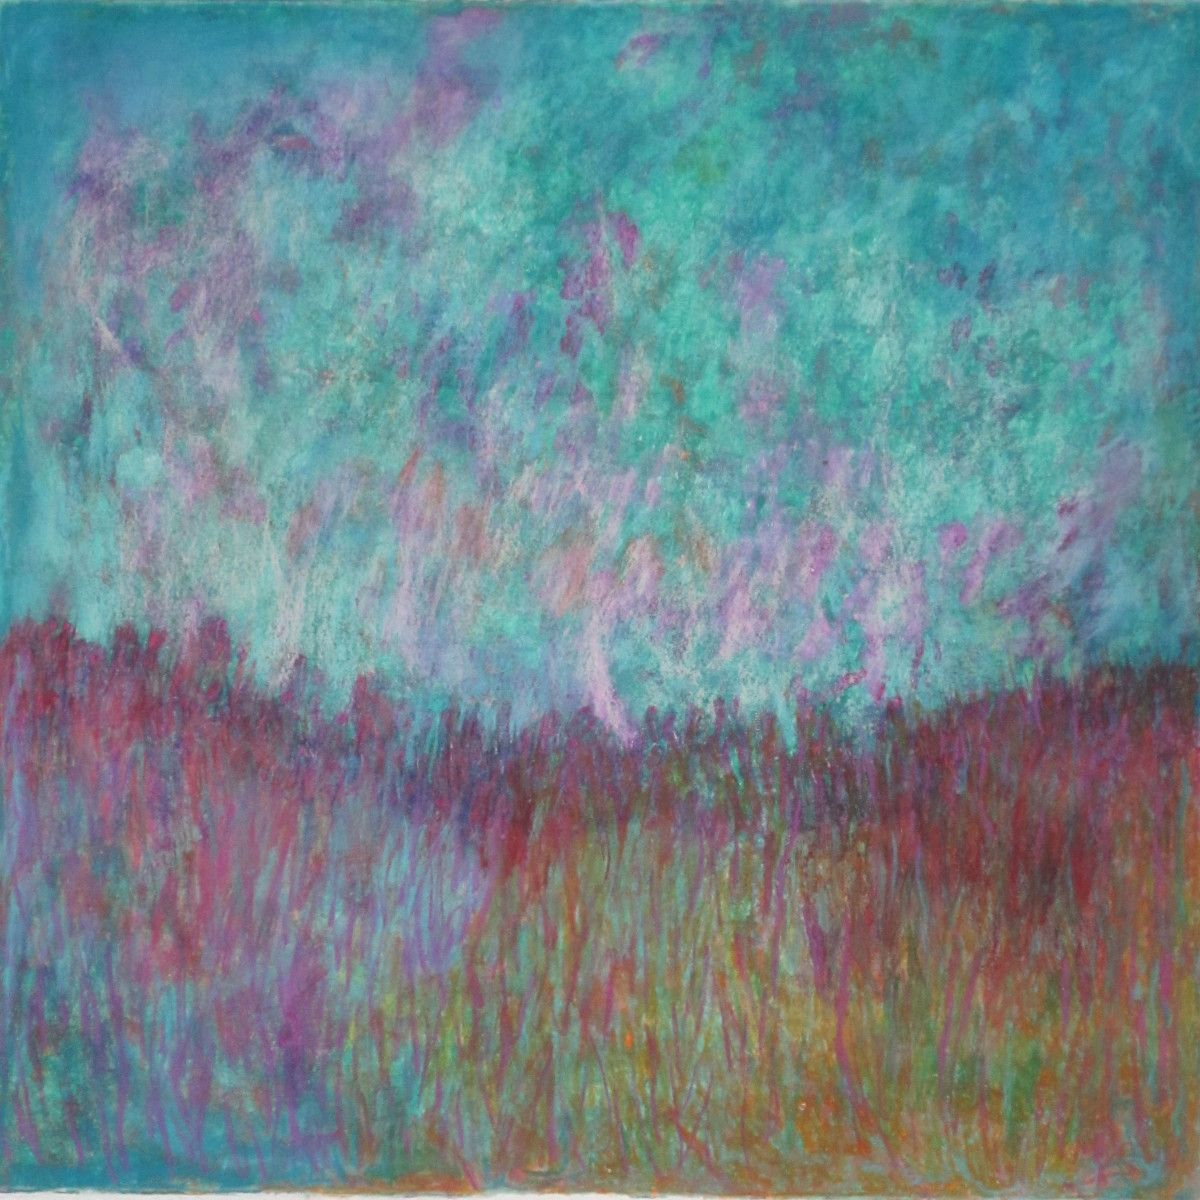 Maria Hughes.  Dreamland,  Monotype, 20 x 19 in.